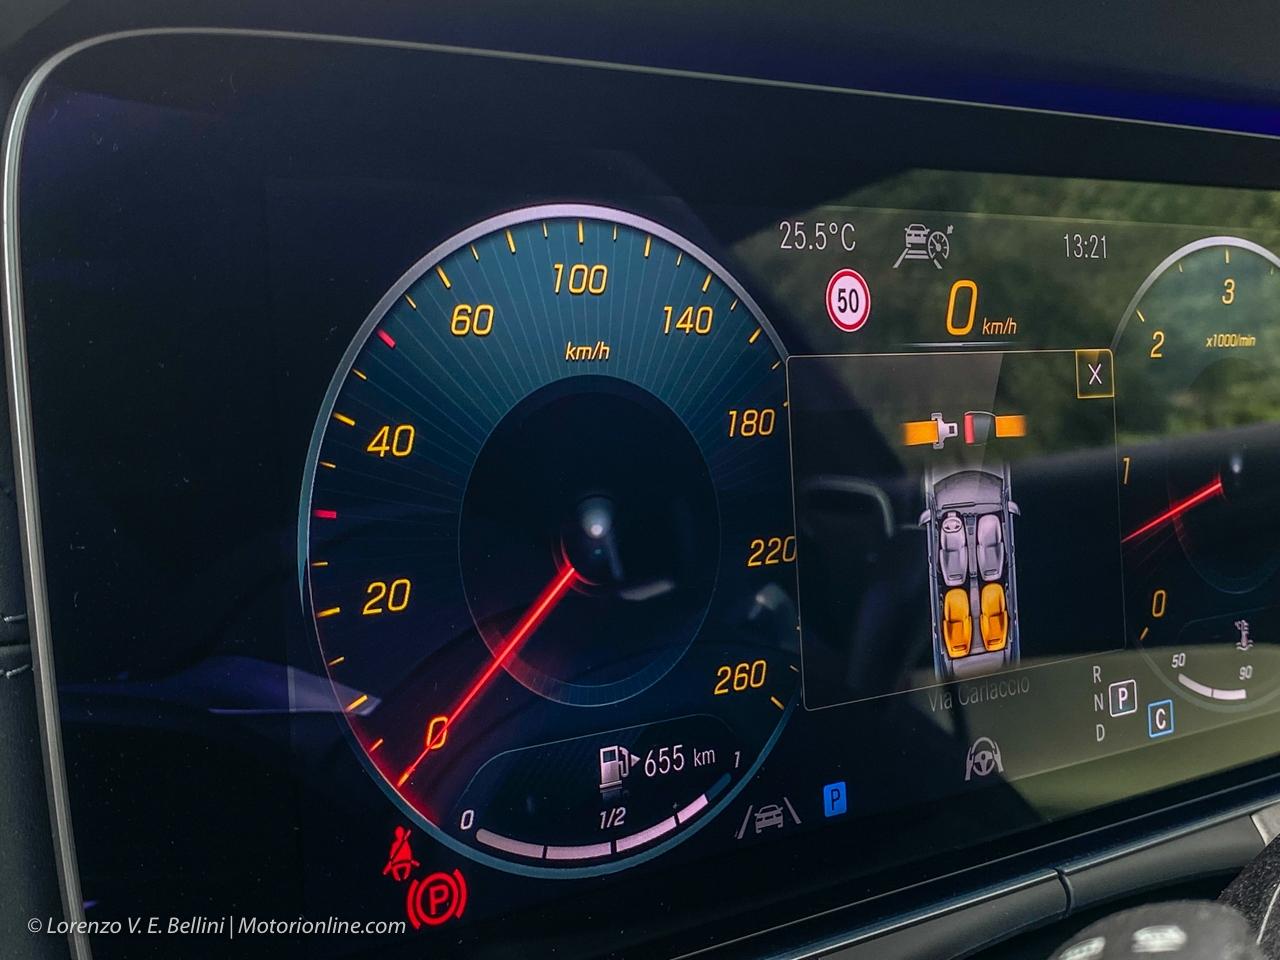 Mercedes Classe E 2020 - Prova su Strada in Anteprima